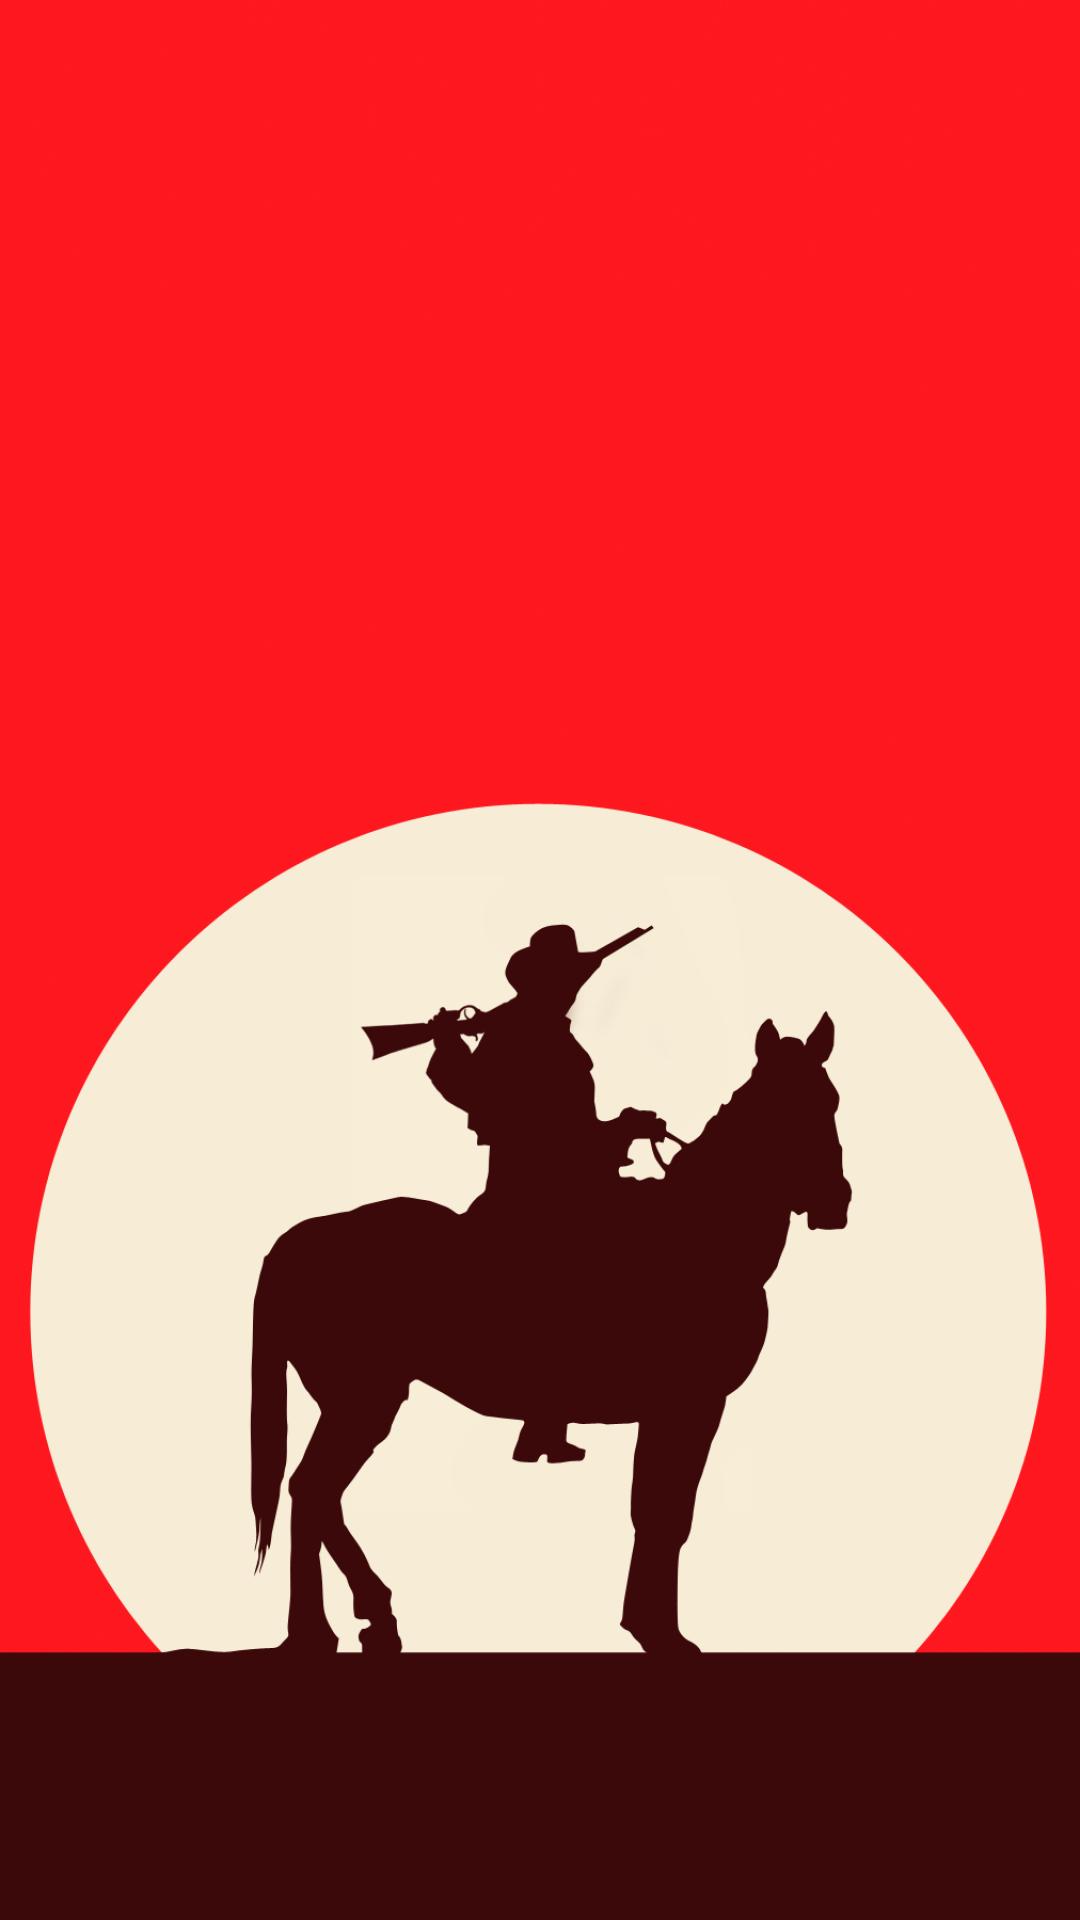 Western Iphone Wallpapers Top Free Western Iphone